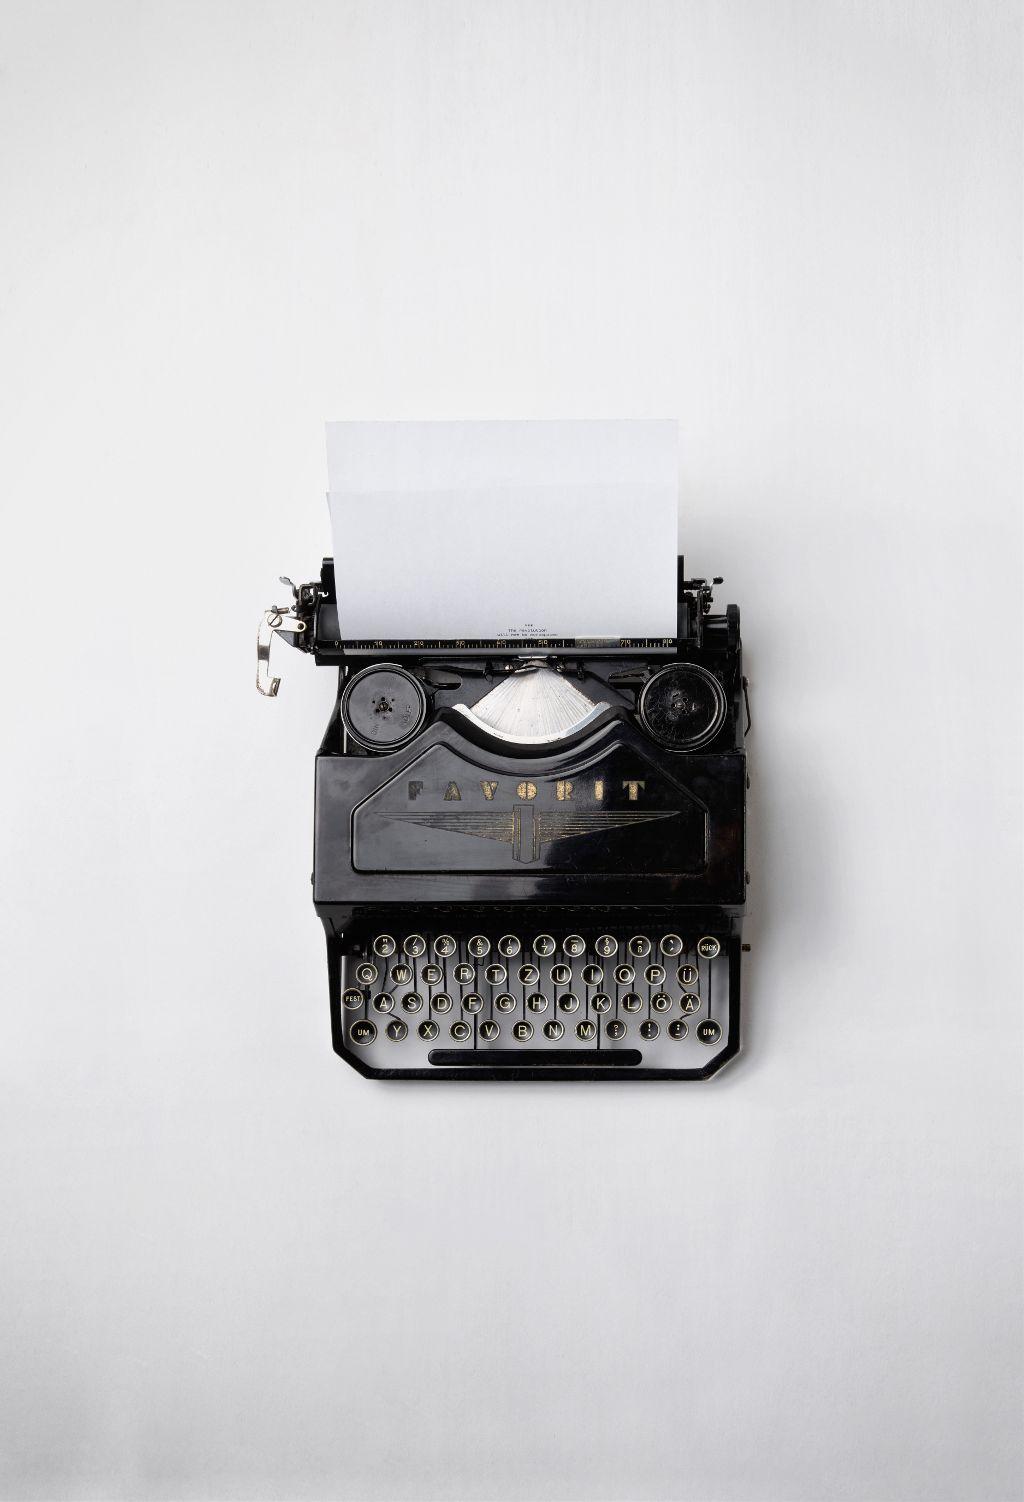 Bring a splash of creativity to this image! Unsplash (Public Domain) #vintage #typewriter #retro #freetoedit